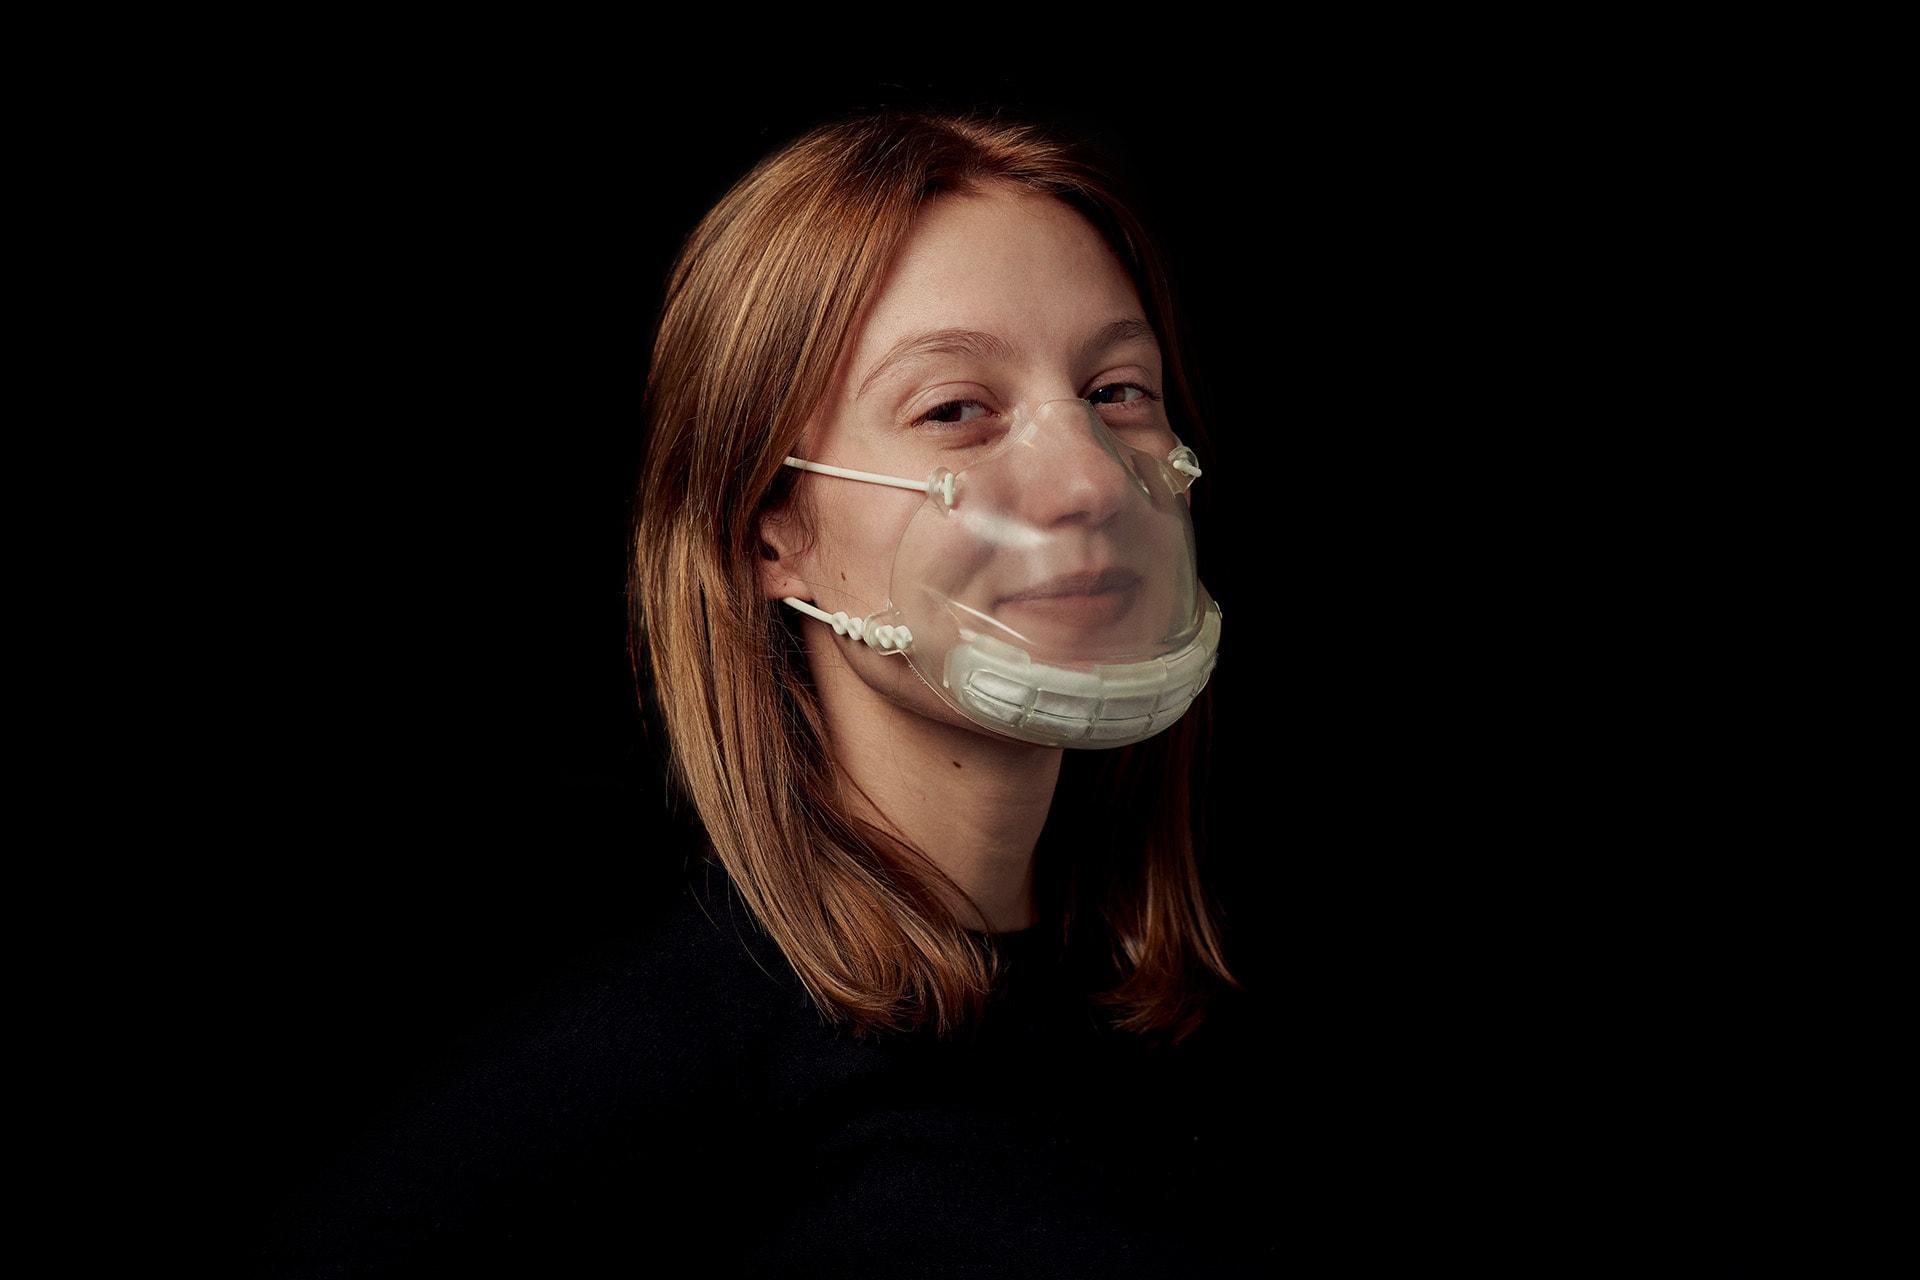 Lächelnde Frau mit Smile-Maske